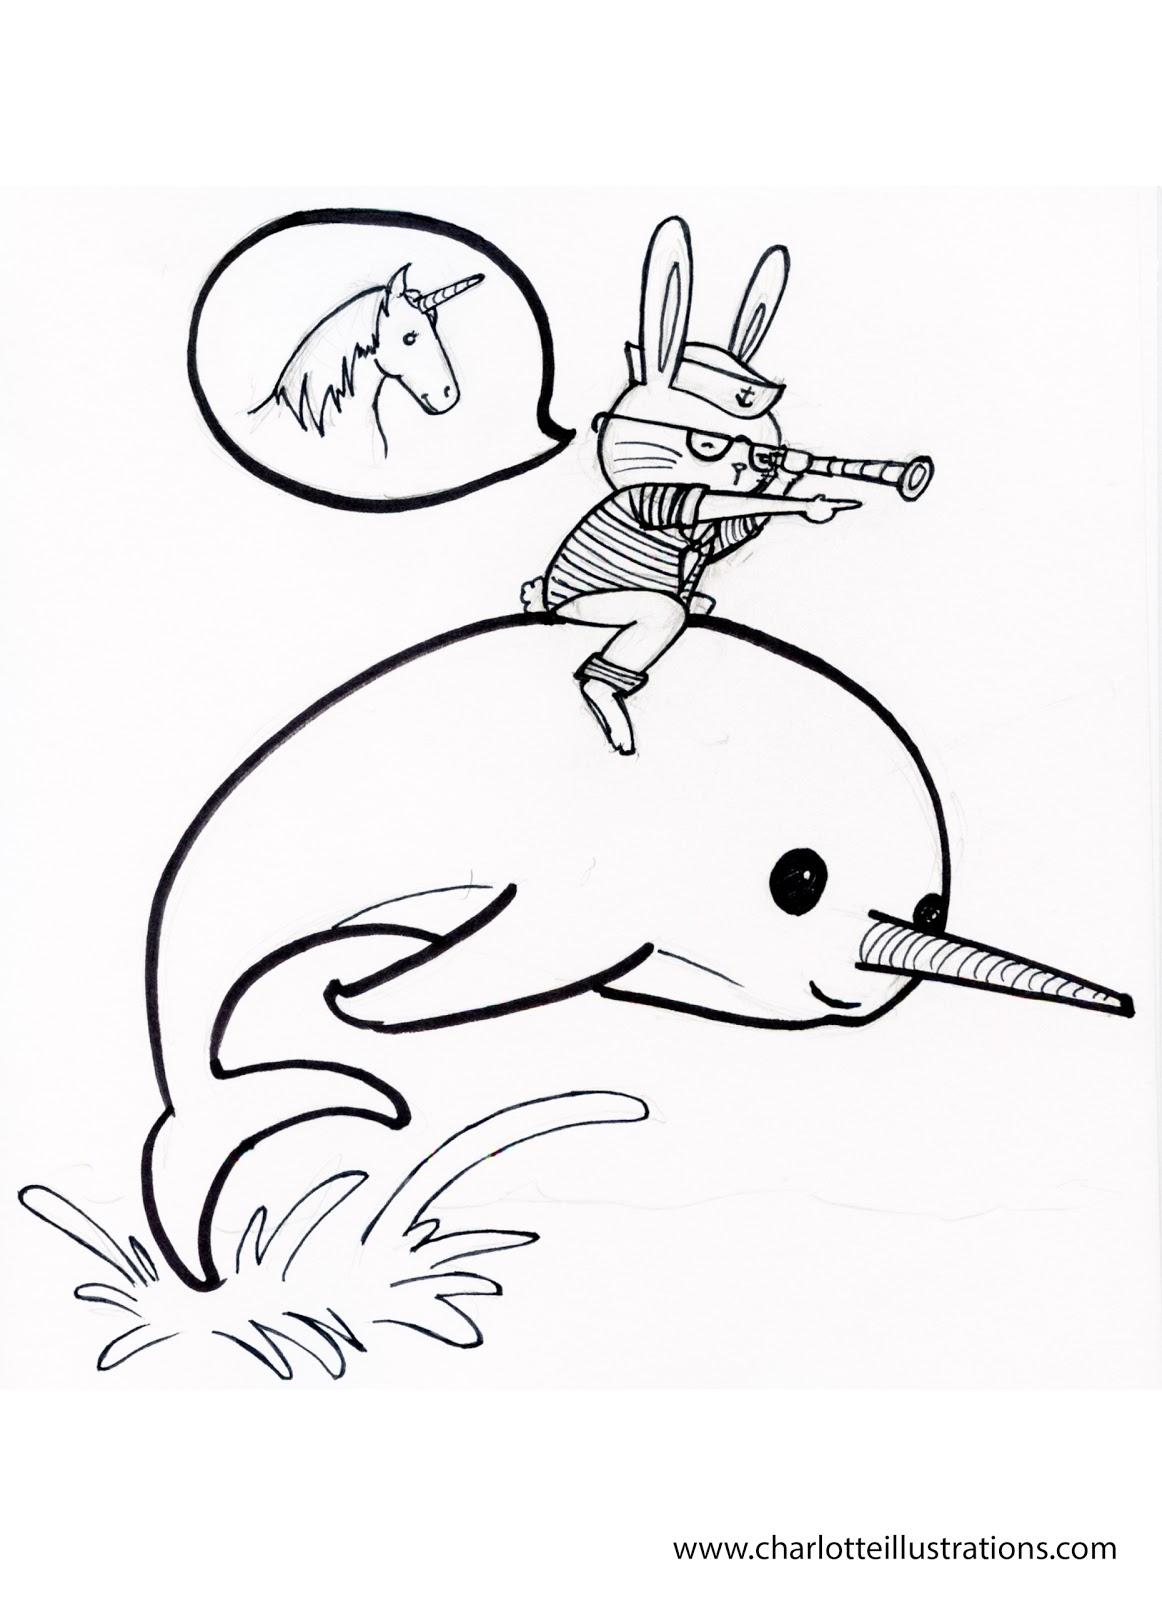 Charlotte Illustrations: swim